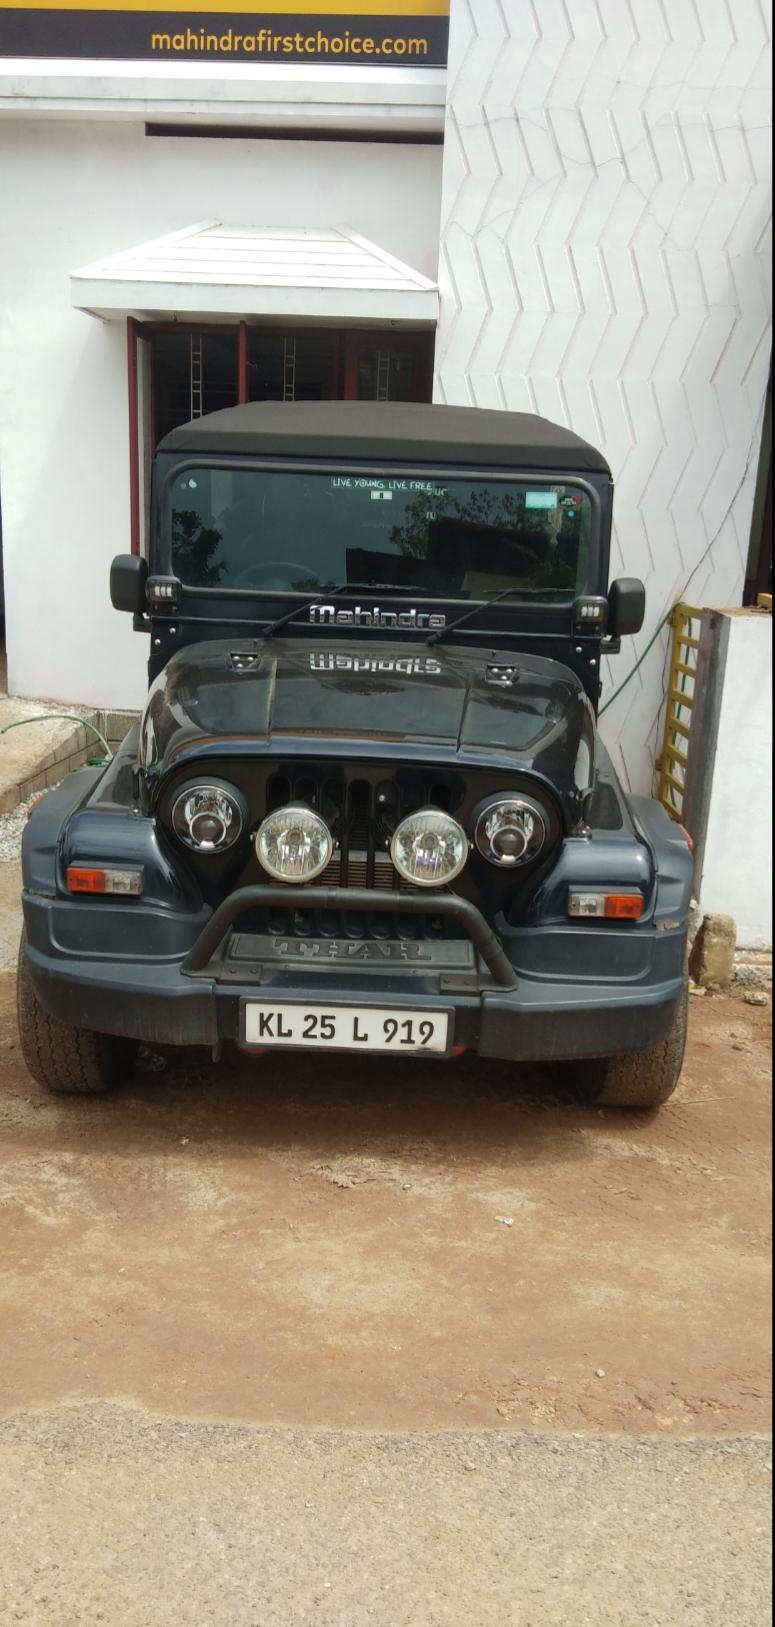 Chevrolet Cruze Olx Kerala Kollam ✓ All About Chevrolet